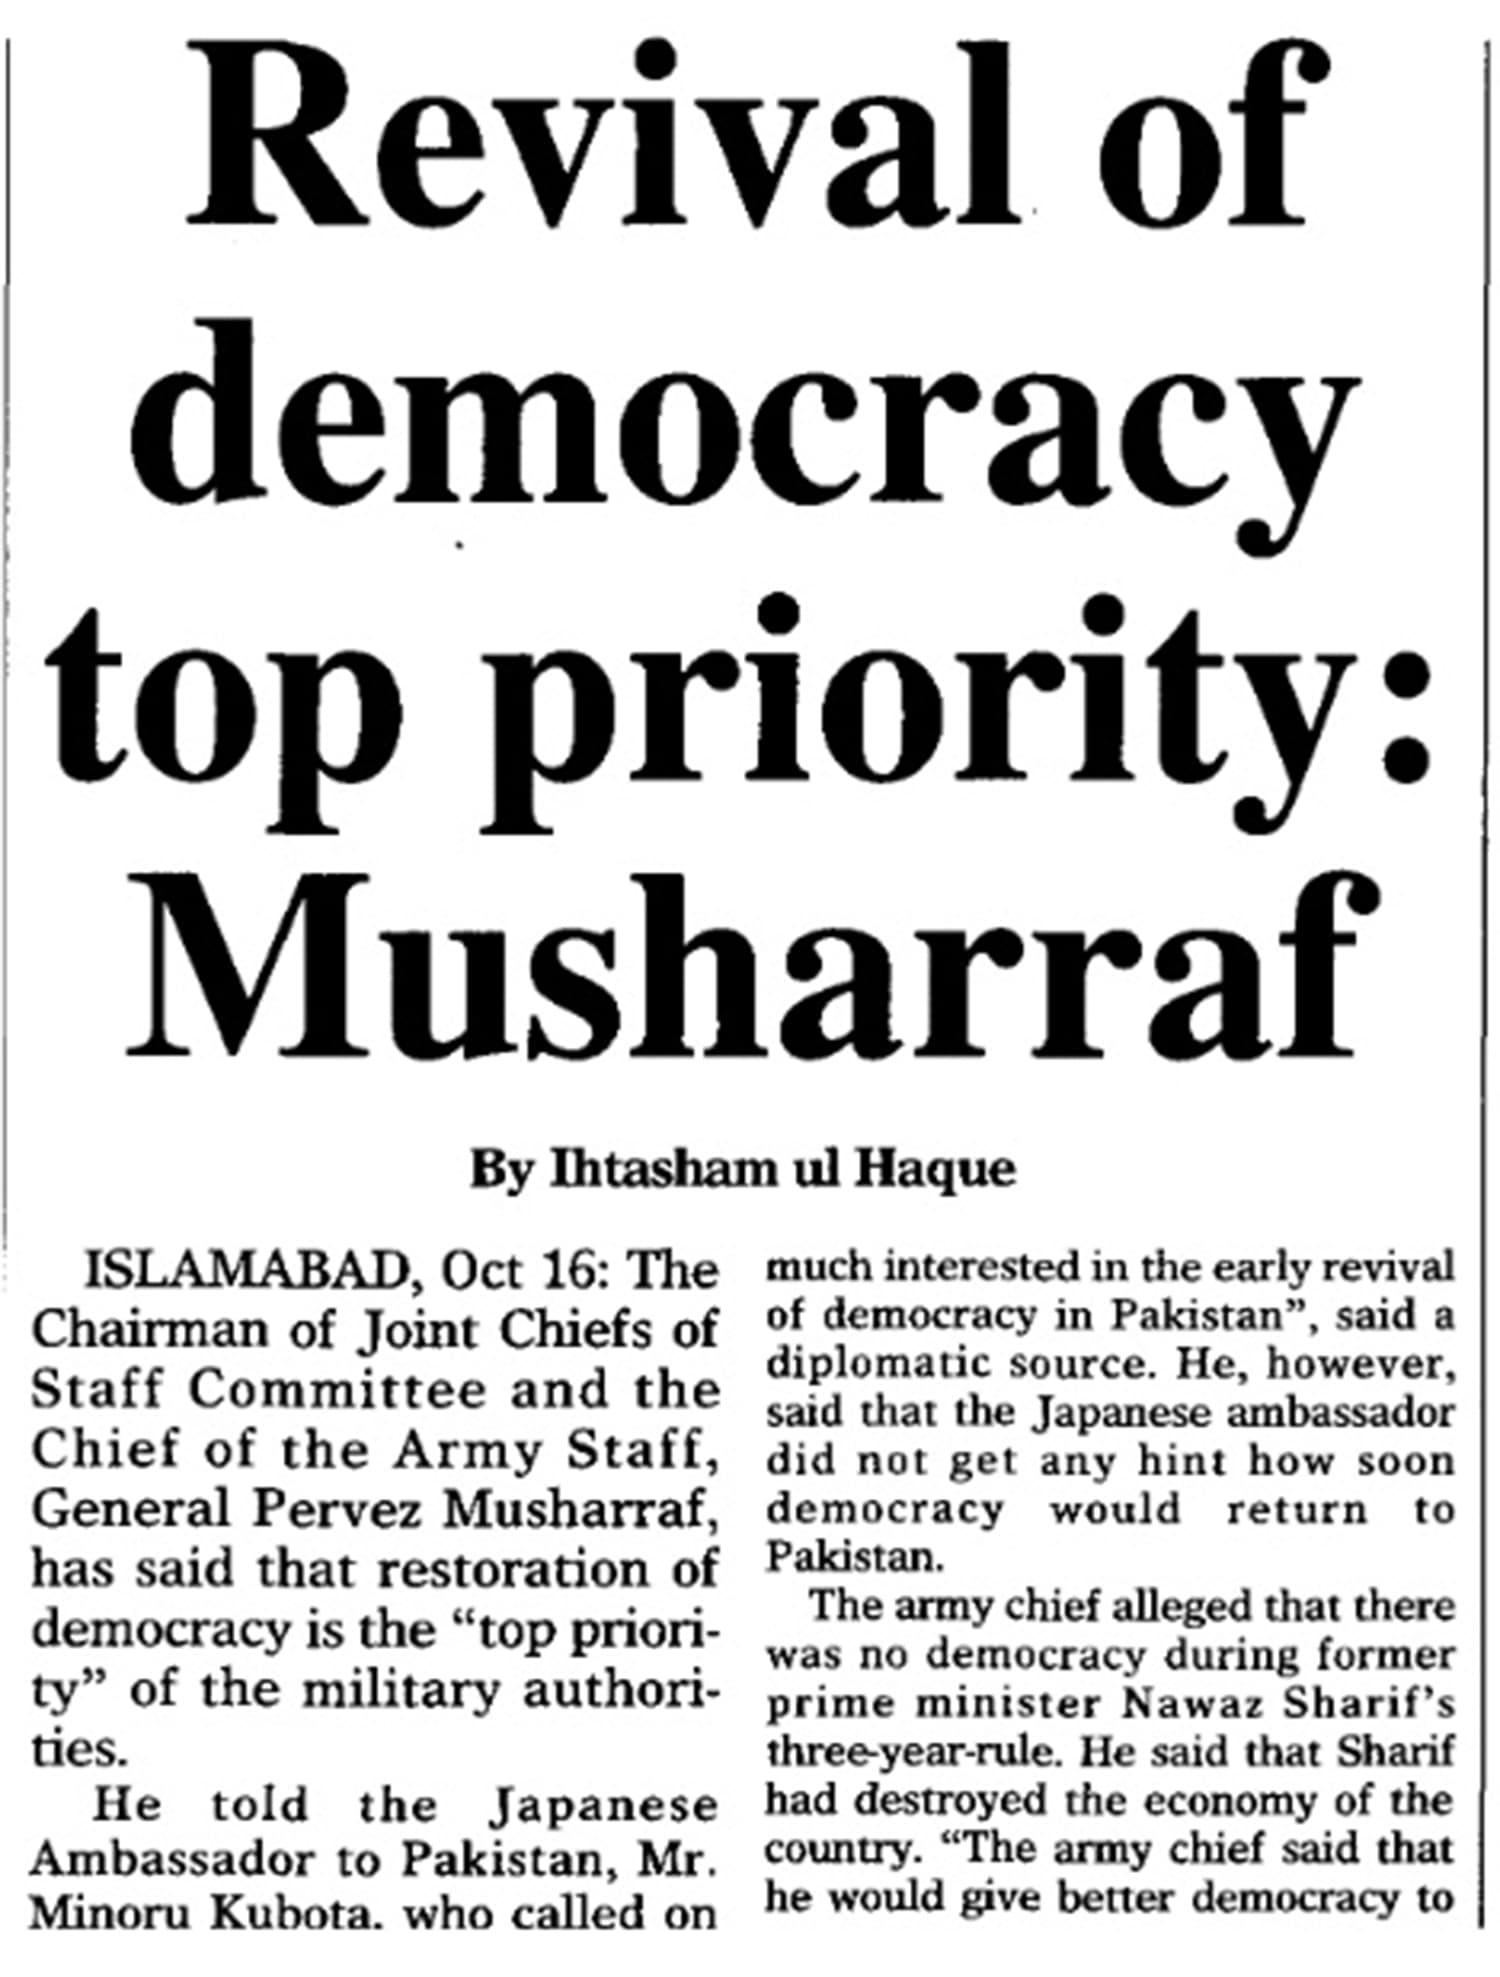 1999: Nawaz Sharif's government dismissed, Musharraf takes